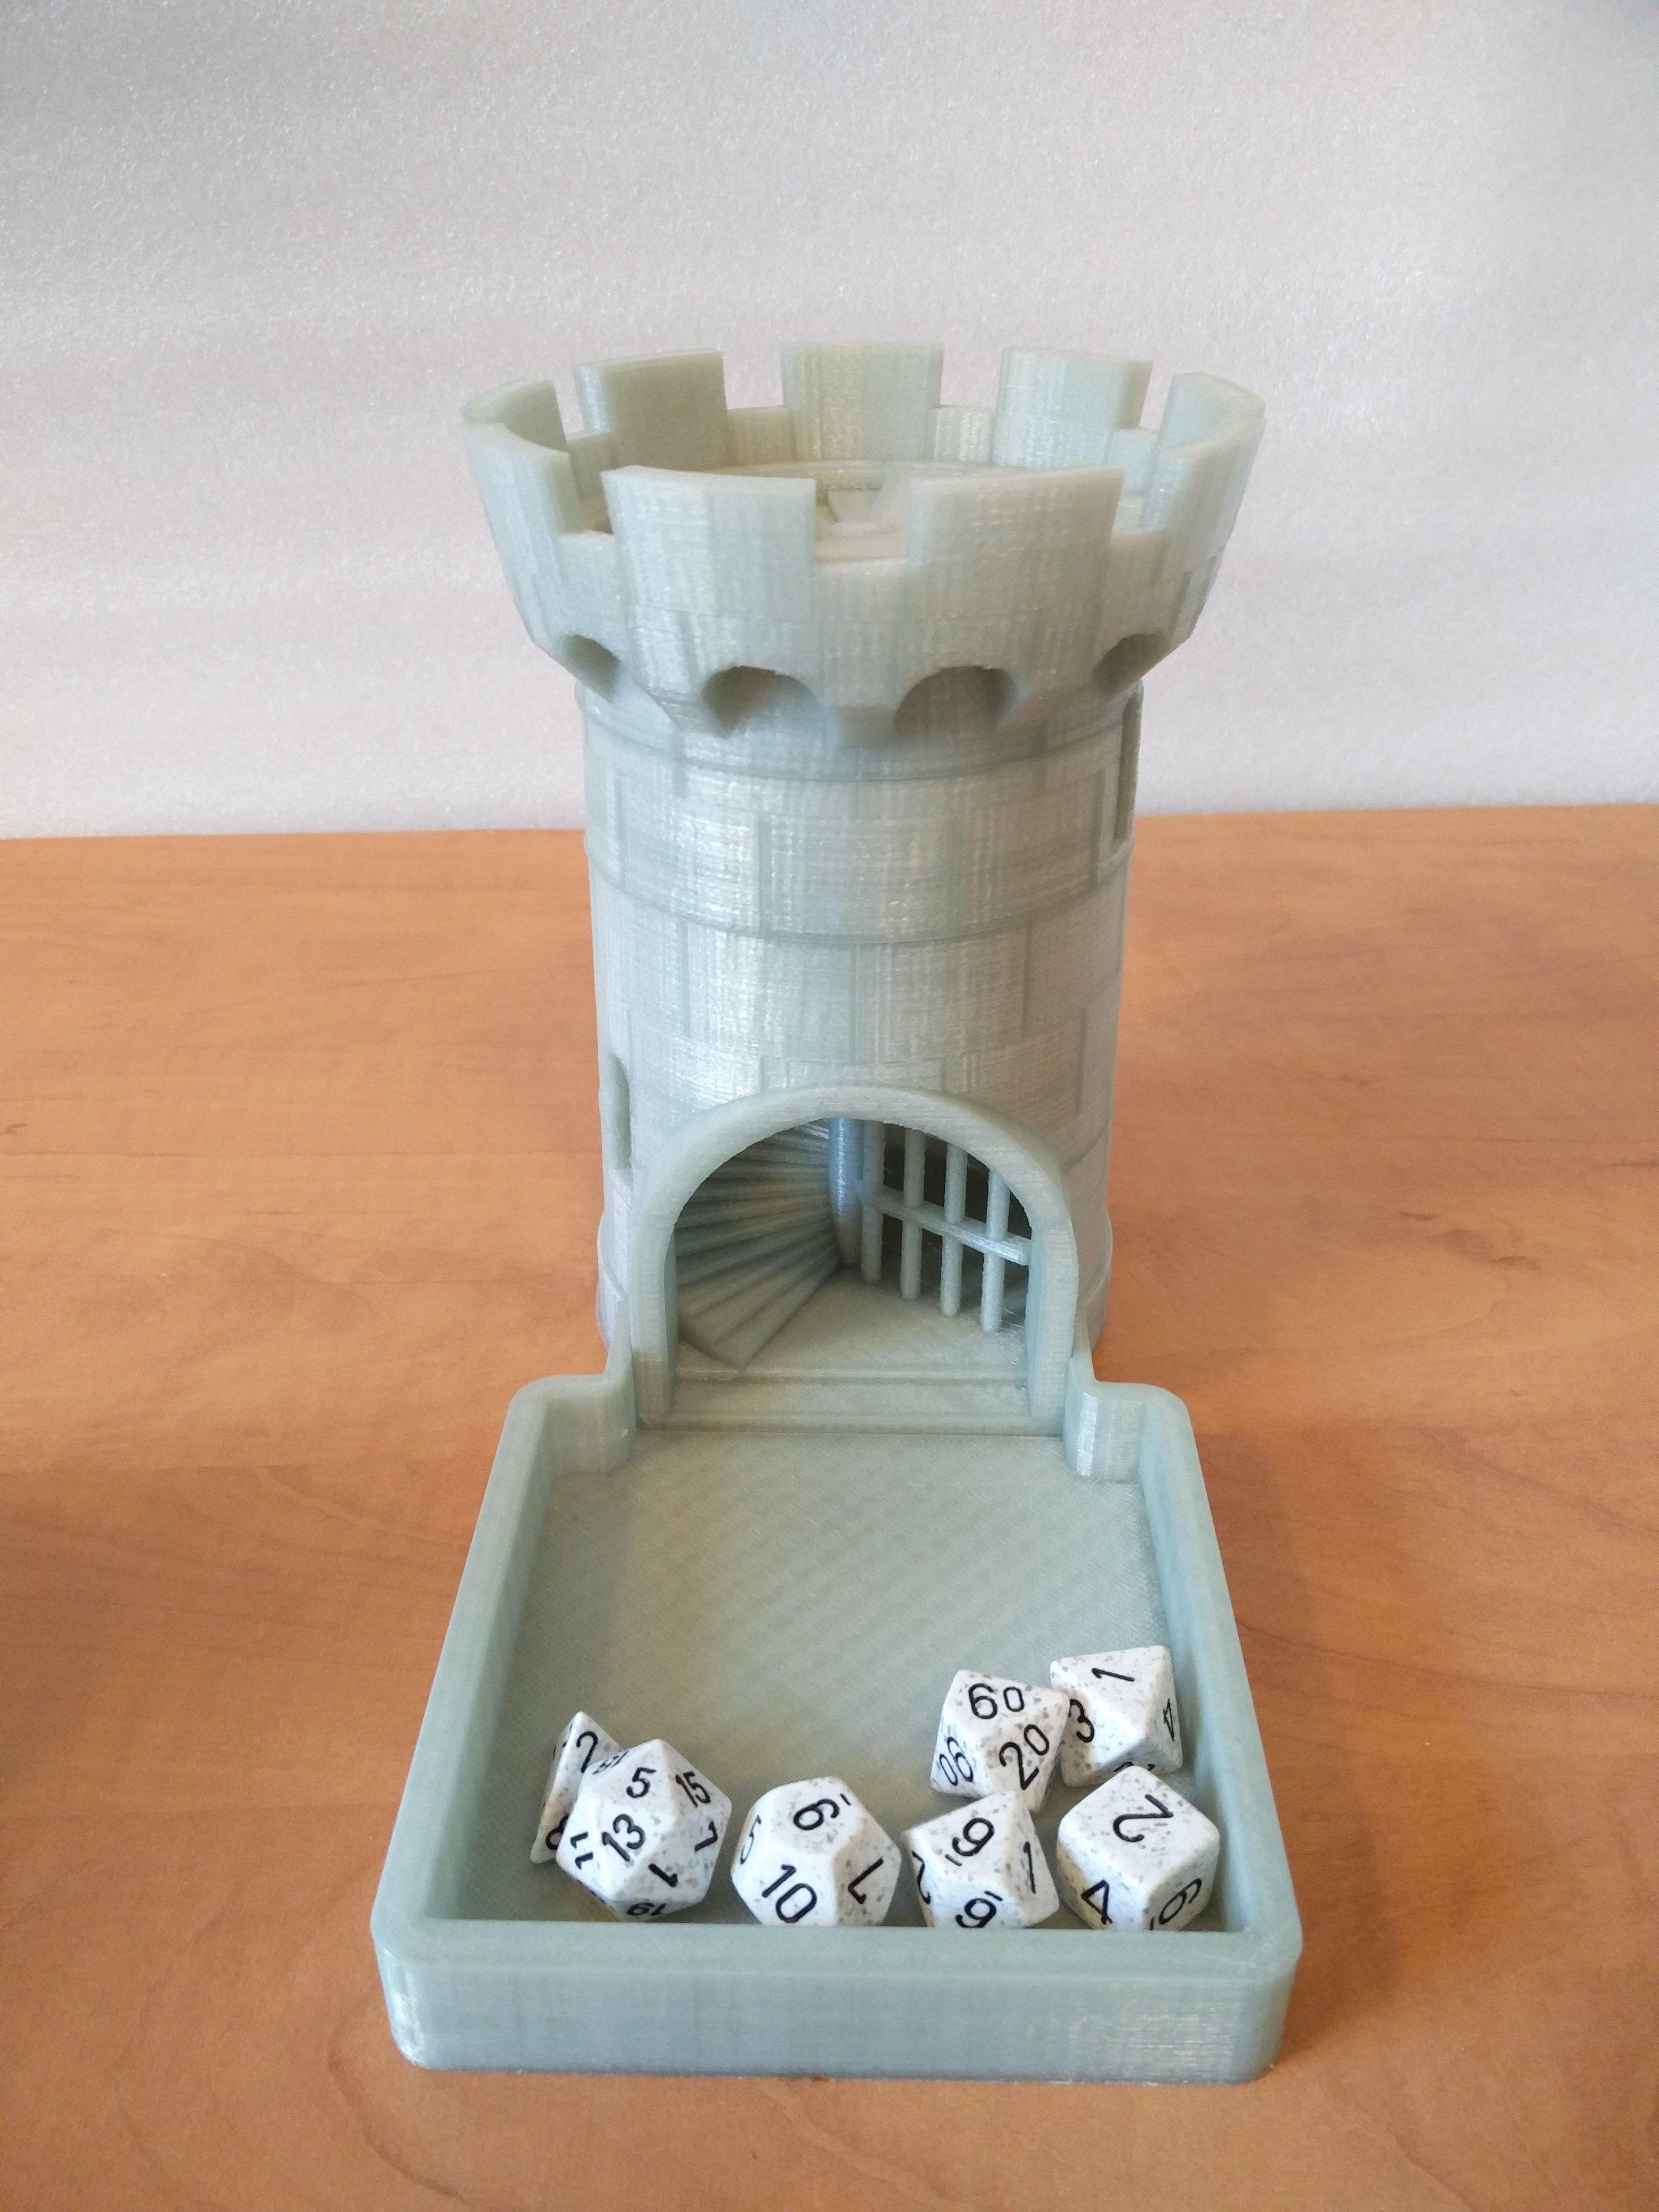 Dice Tower Black Castle Dice Towers